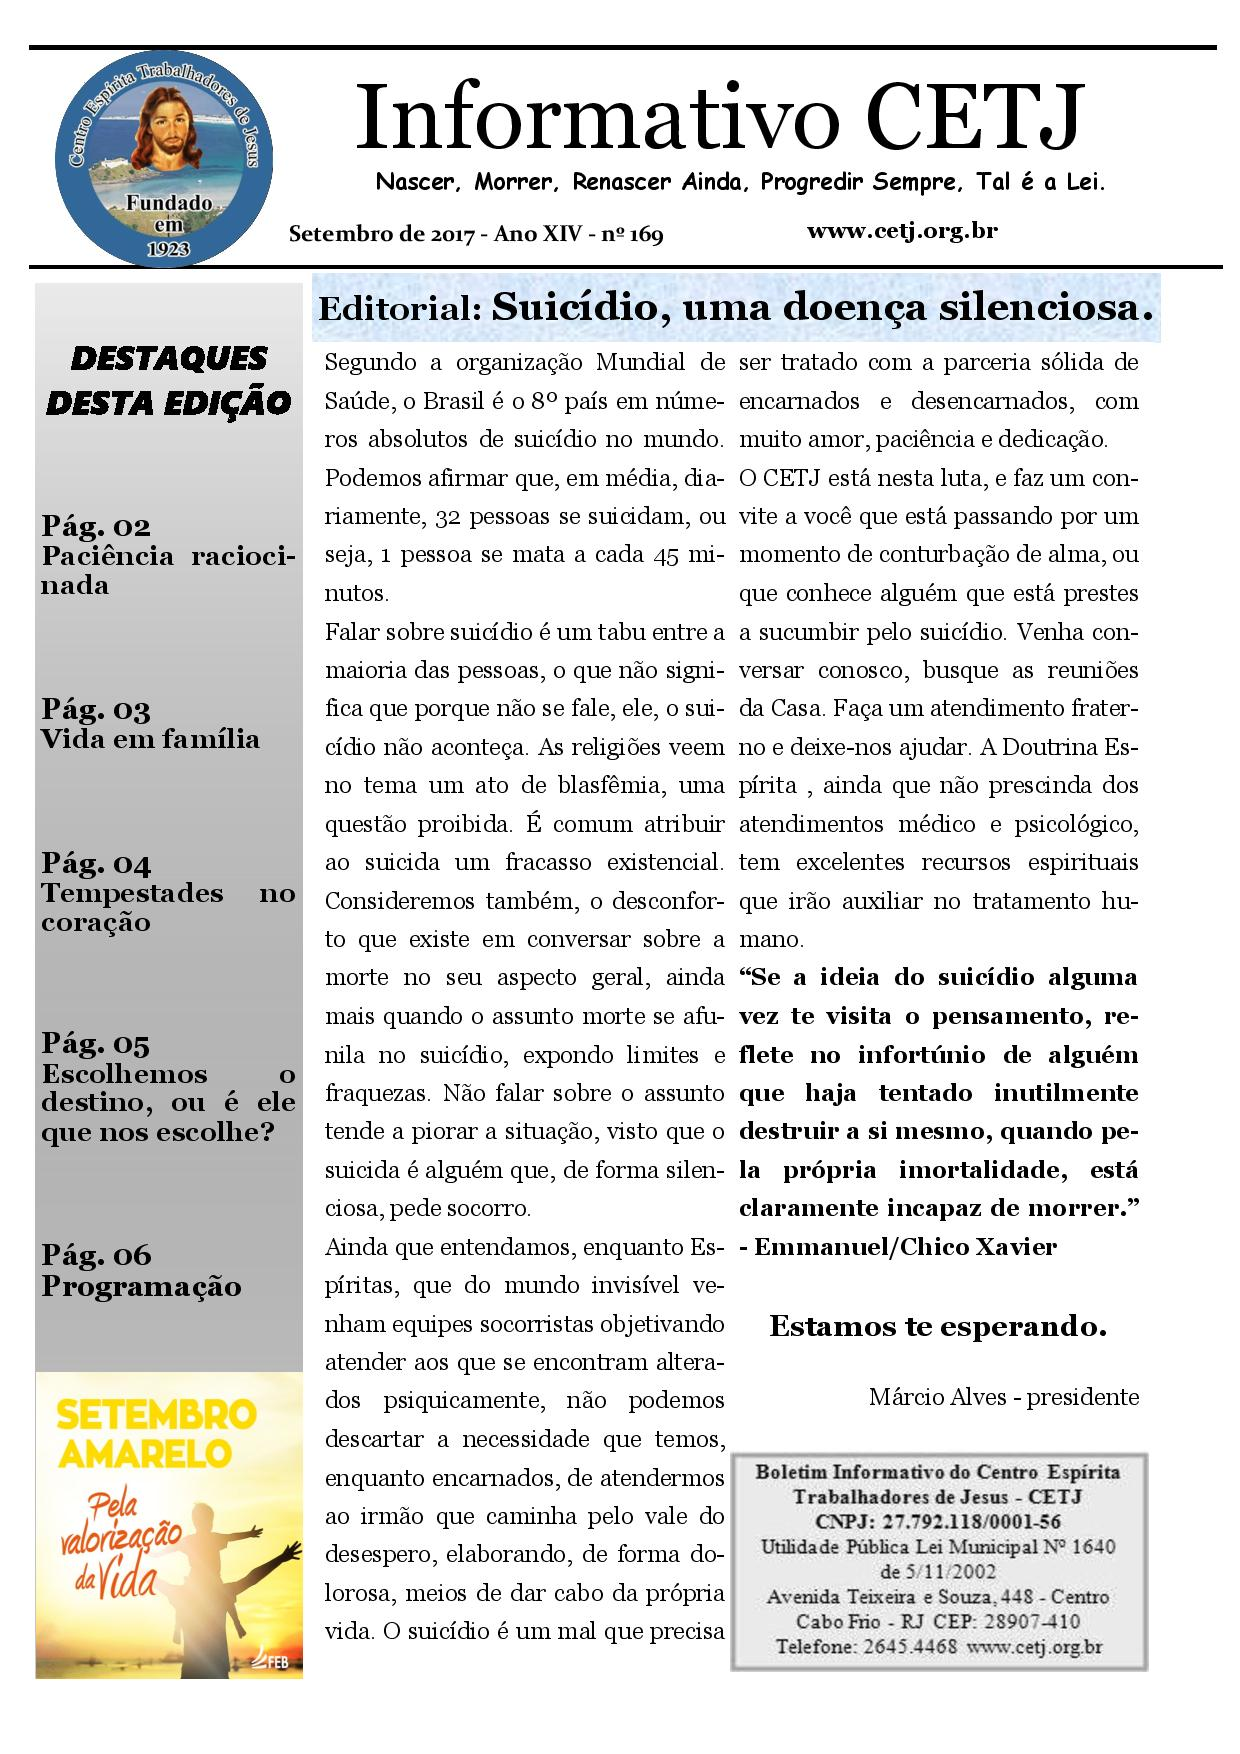 Informativo setembro de 2017_net-page-001